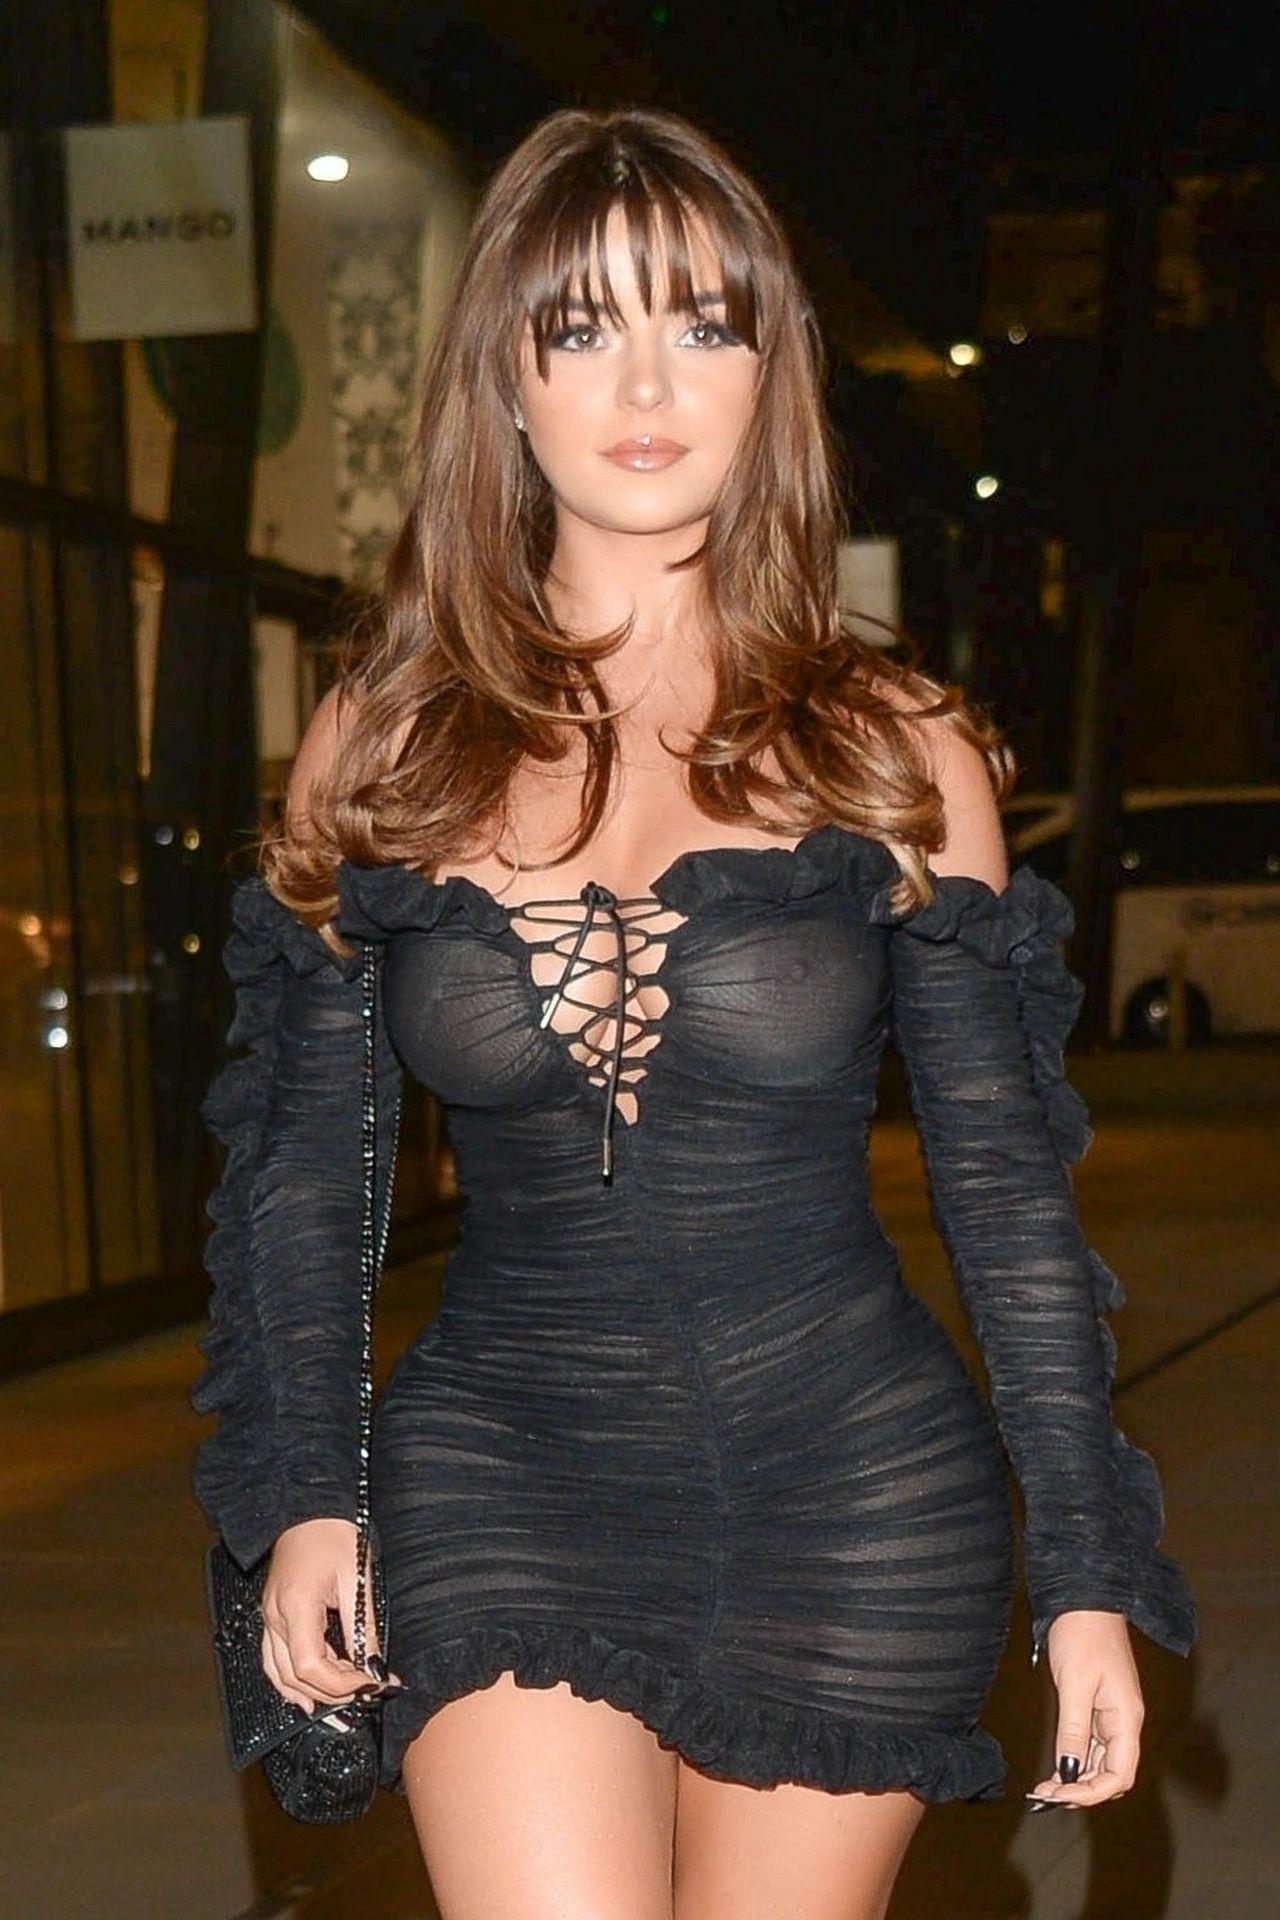 Demi Rose Mawby Braless See Through Dress | Hot Celebs Home